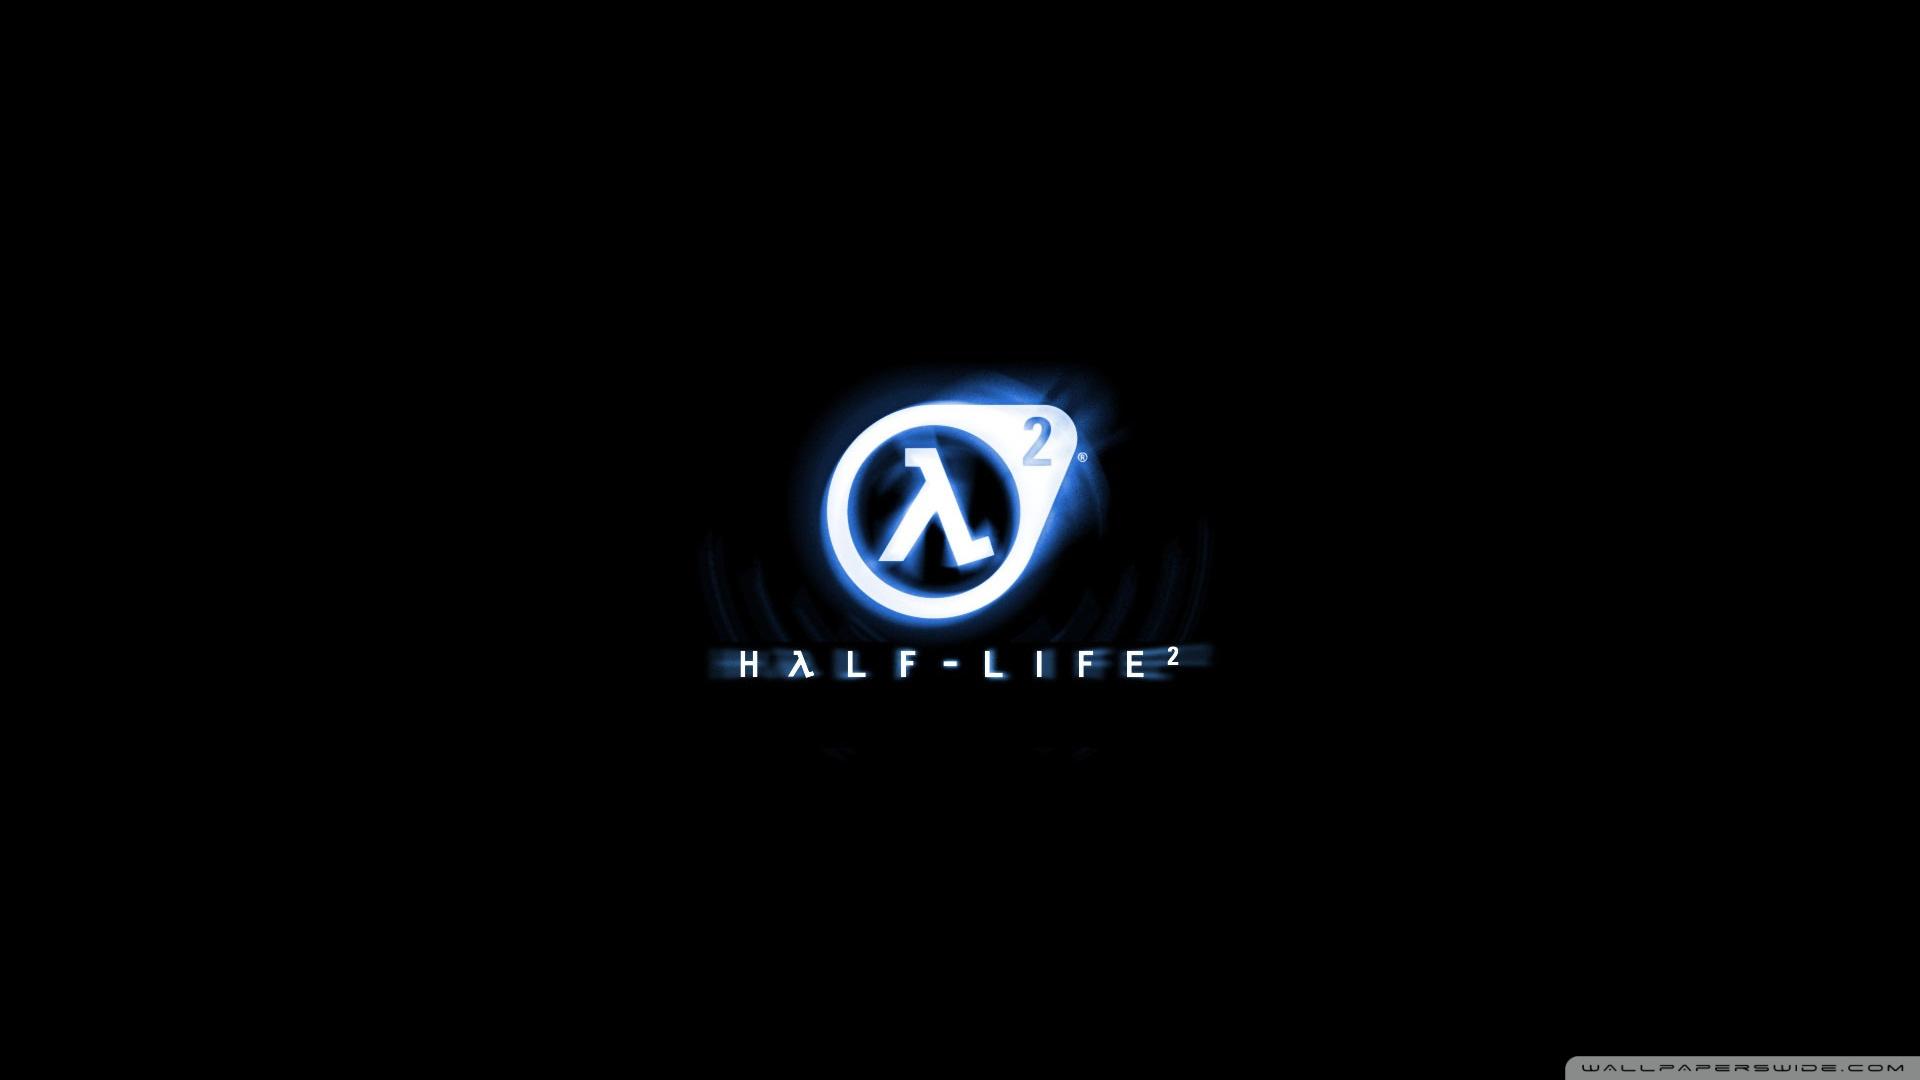 Half Life 2 4 Ultra Hd Desktop Background Wallpaper For 4k Uhd